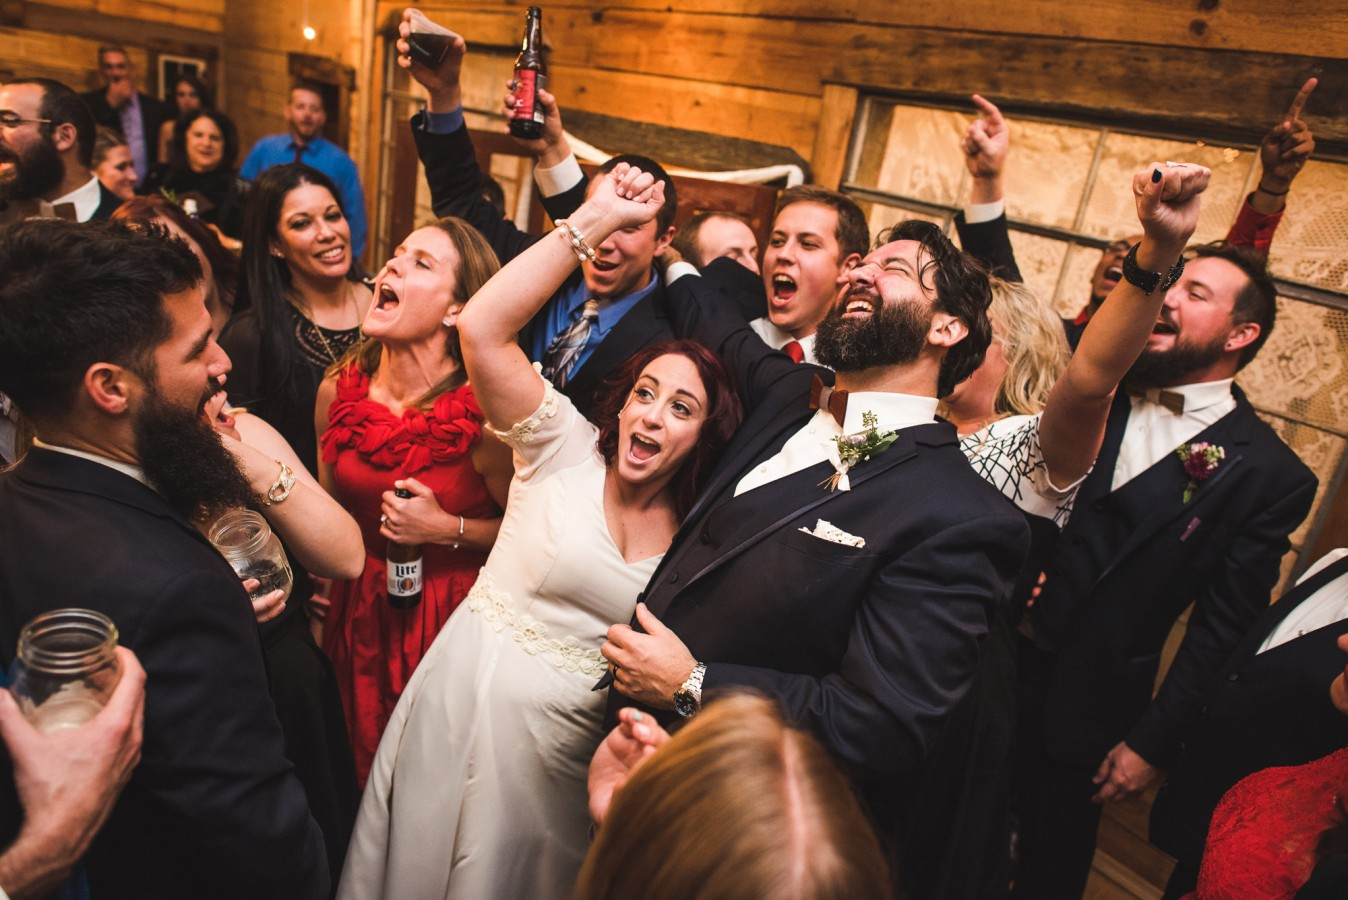 fete-photography-weddings-034